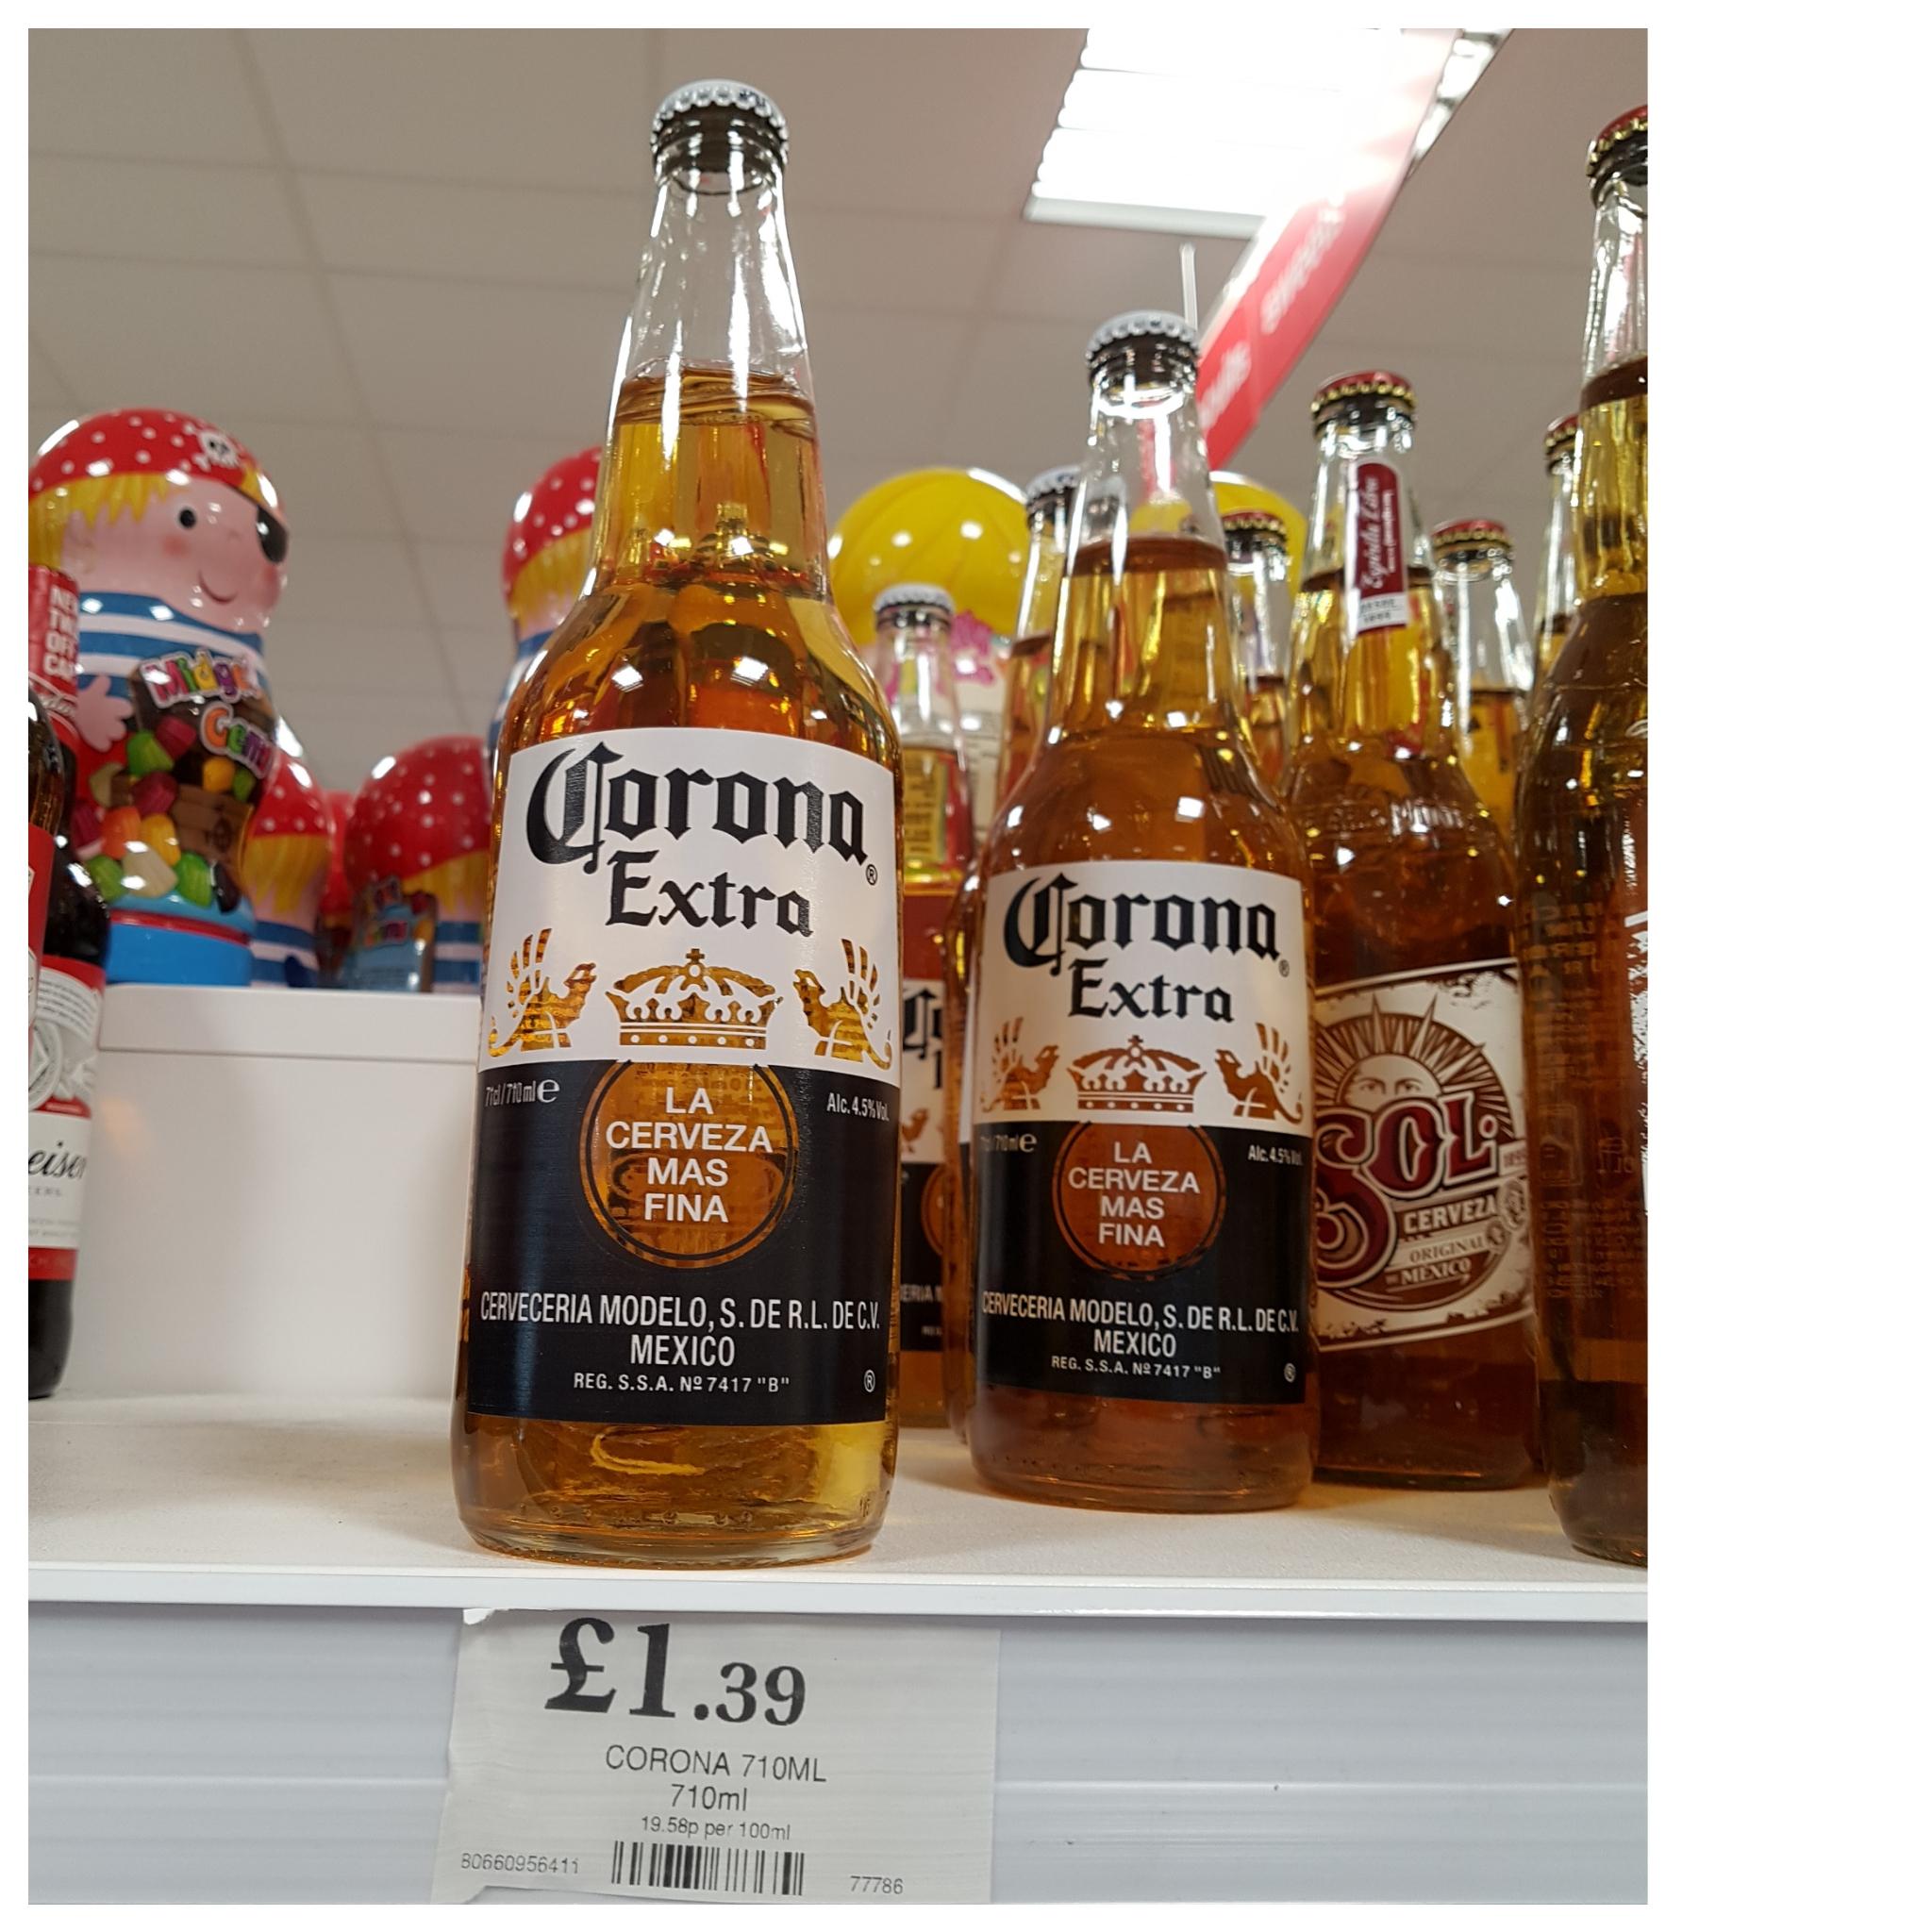 Corona Extra 710ml bottle £1 39 @ Home Bargains - hotukdeals